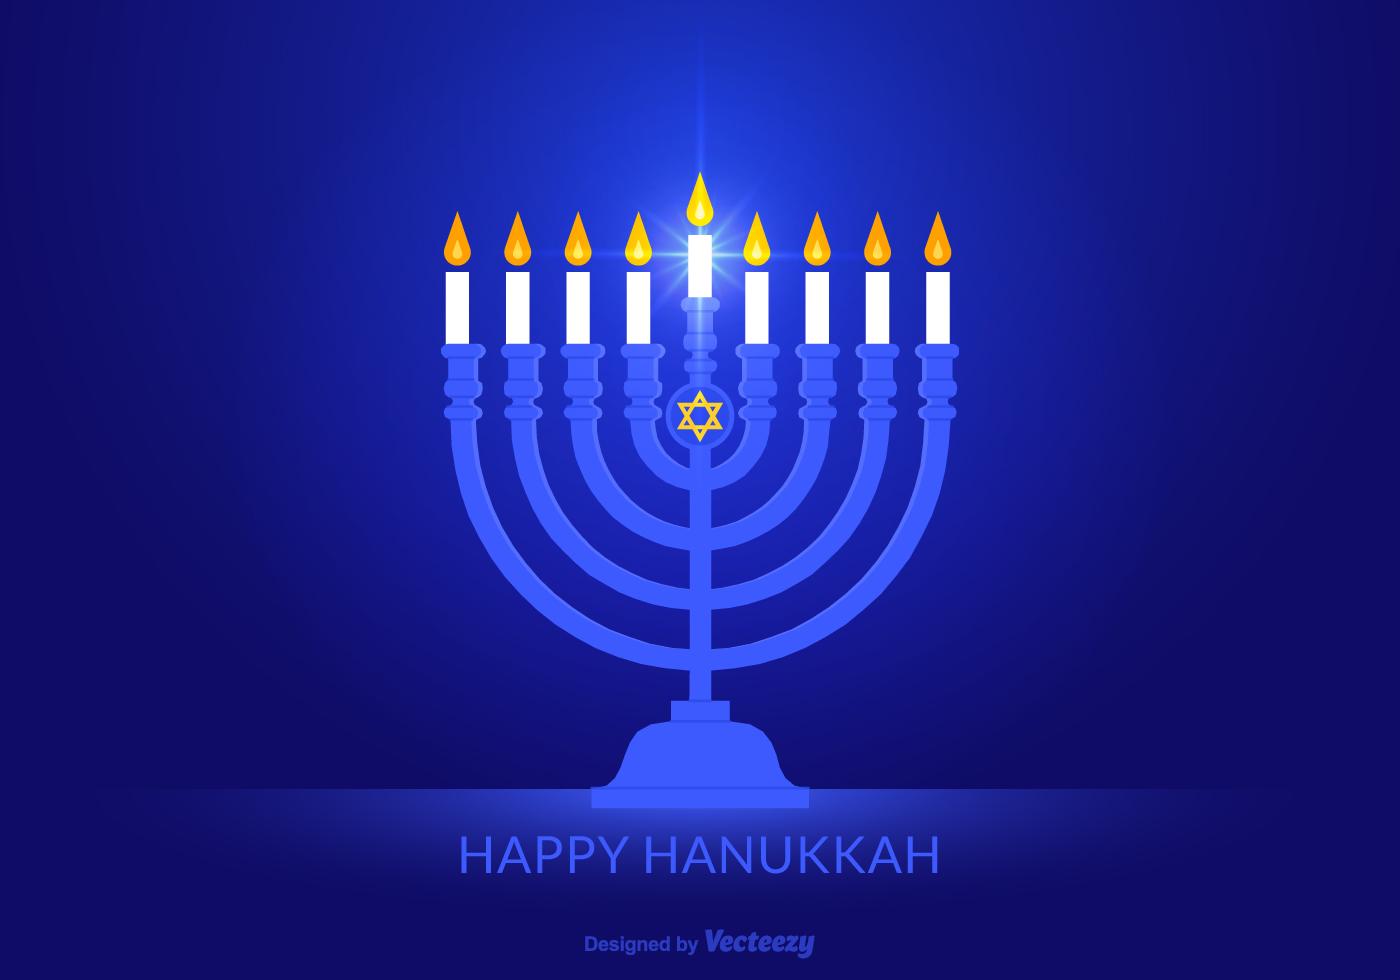 happy hanukkah authorstream - photo #11